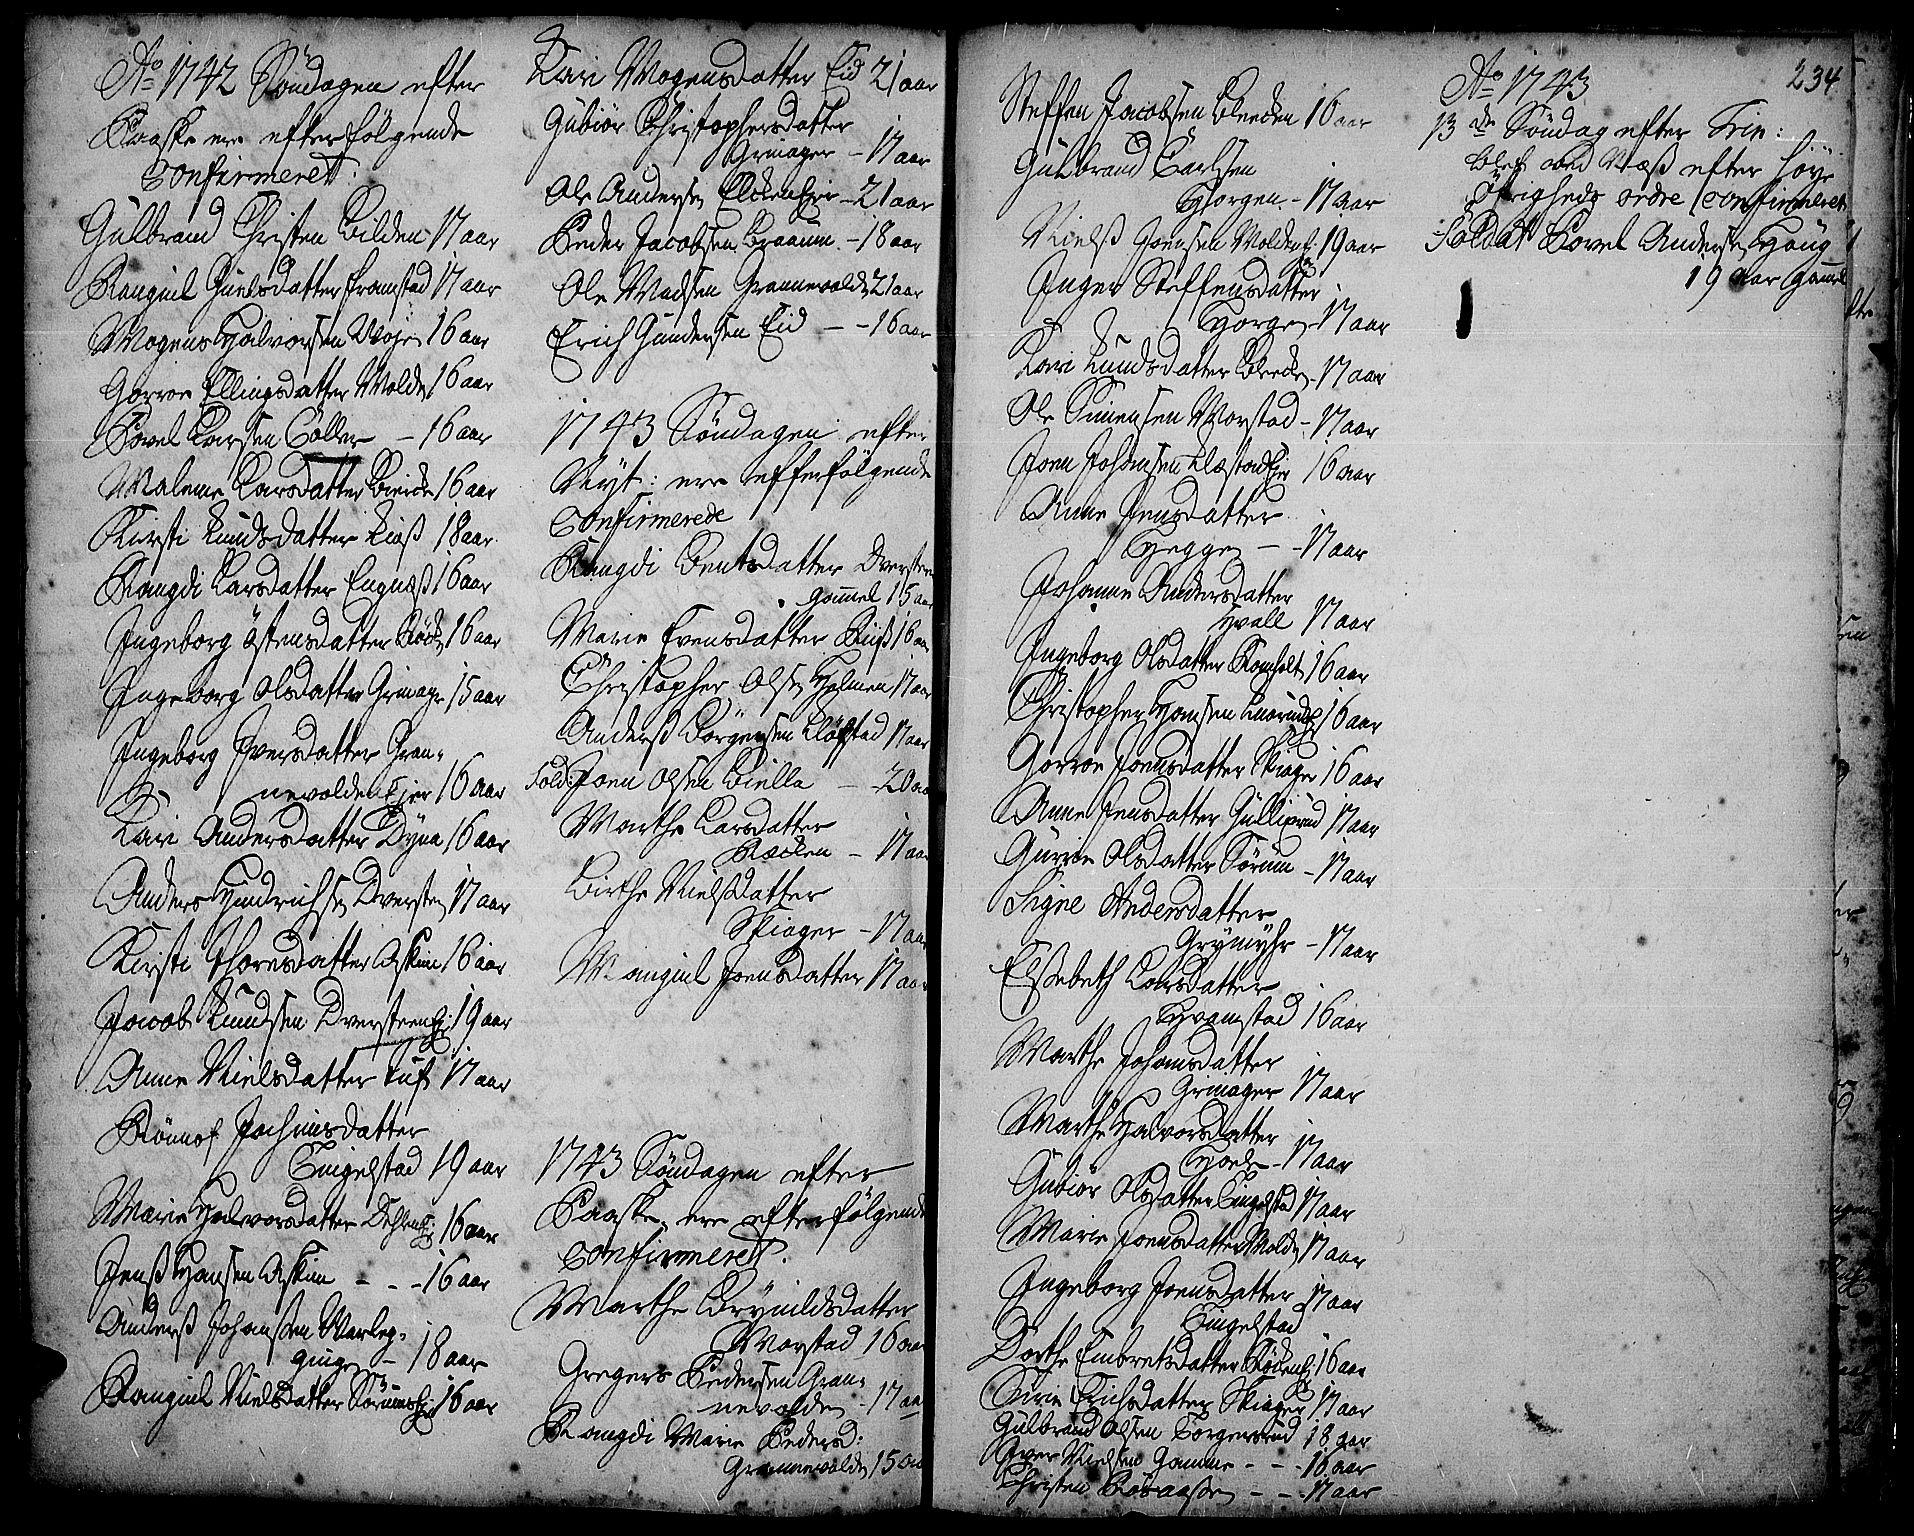 SAH, Gran prestekontor, Ministerialbok nr. 2, 1732-1744, s. 234